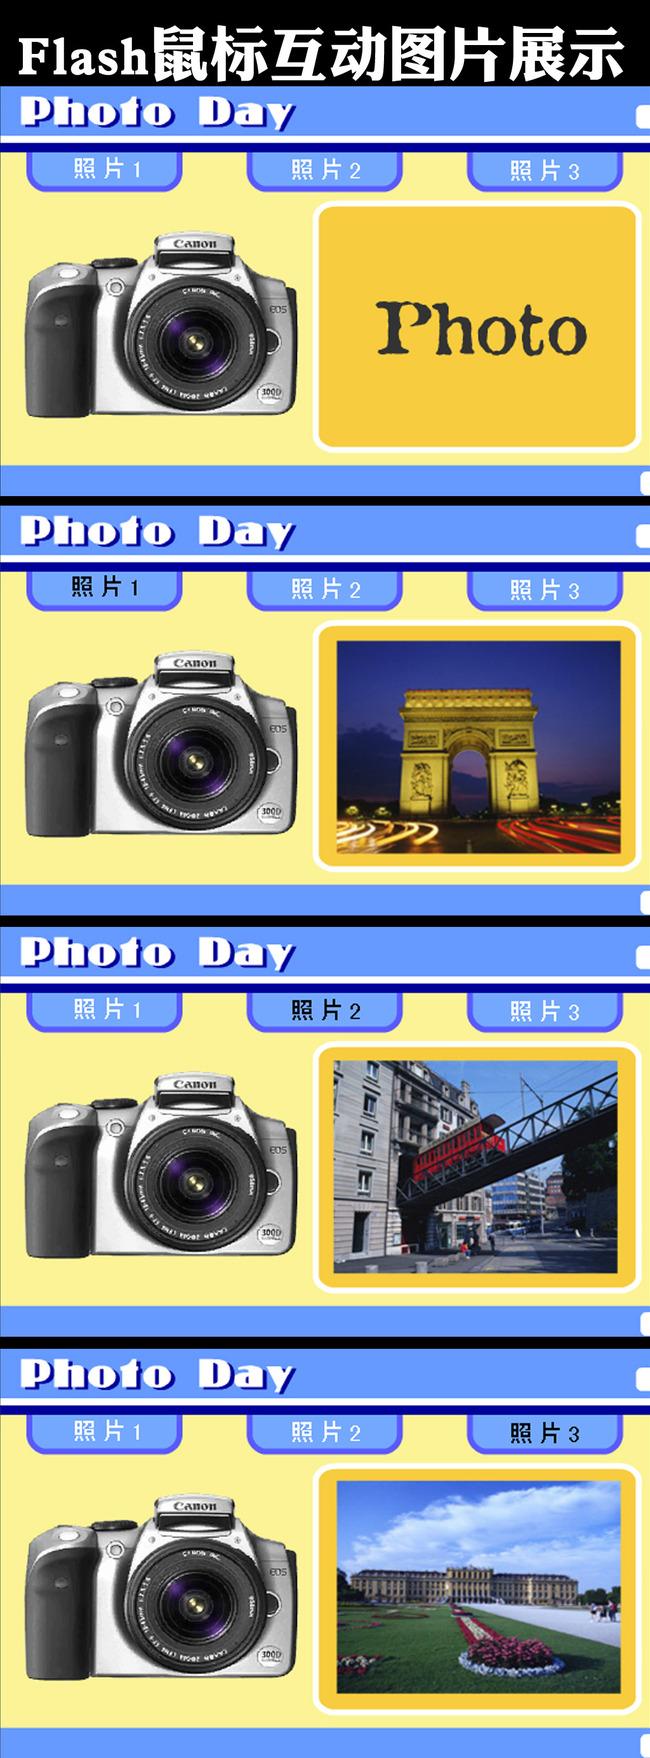 flash多媒体课件制作图片互动